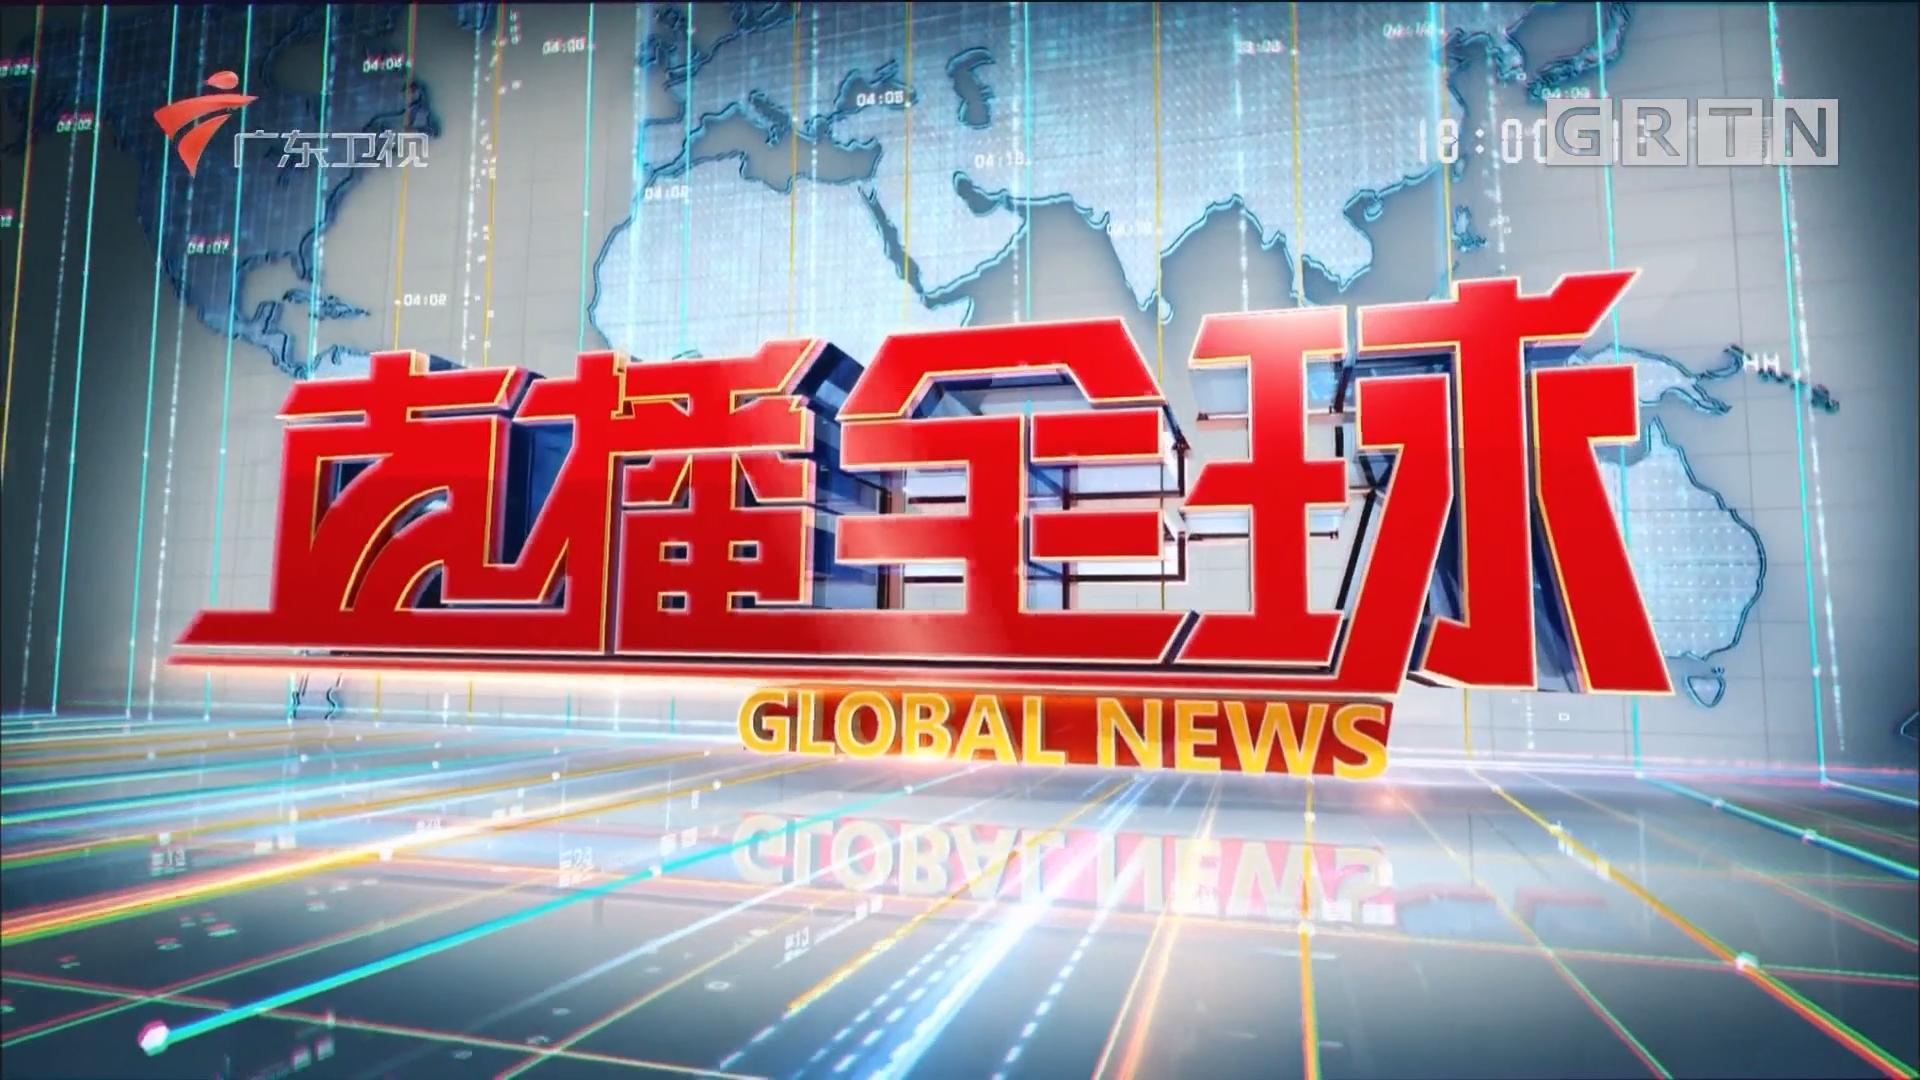 [HD][2018-07-09]直播全球:泰国游船倾覆:失联11人中有5人可能生还 救援行动继续进行 目前还不具备沉船打捞条件